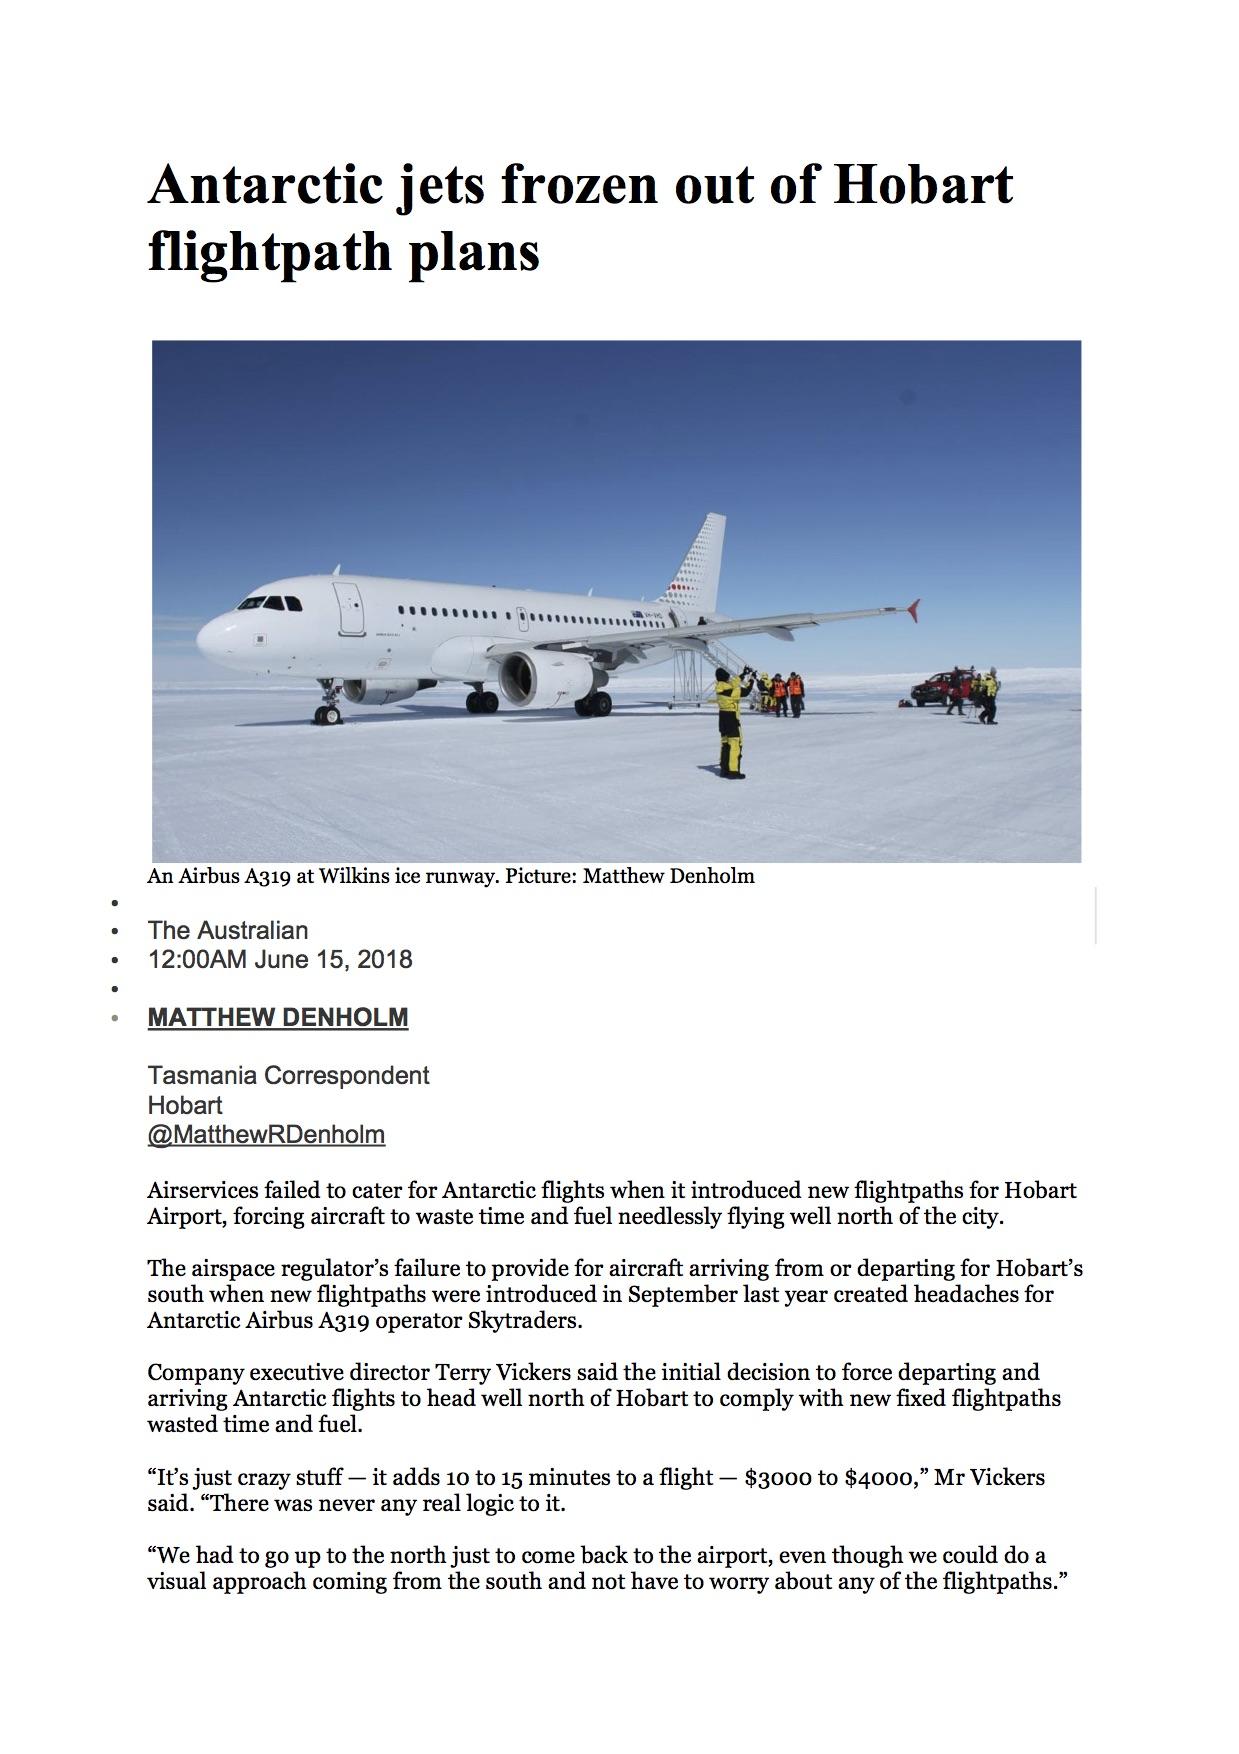 Antarctic jets frozen out of Hobart flightpath plans.jpg